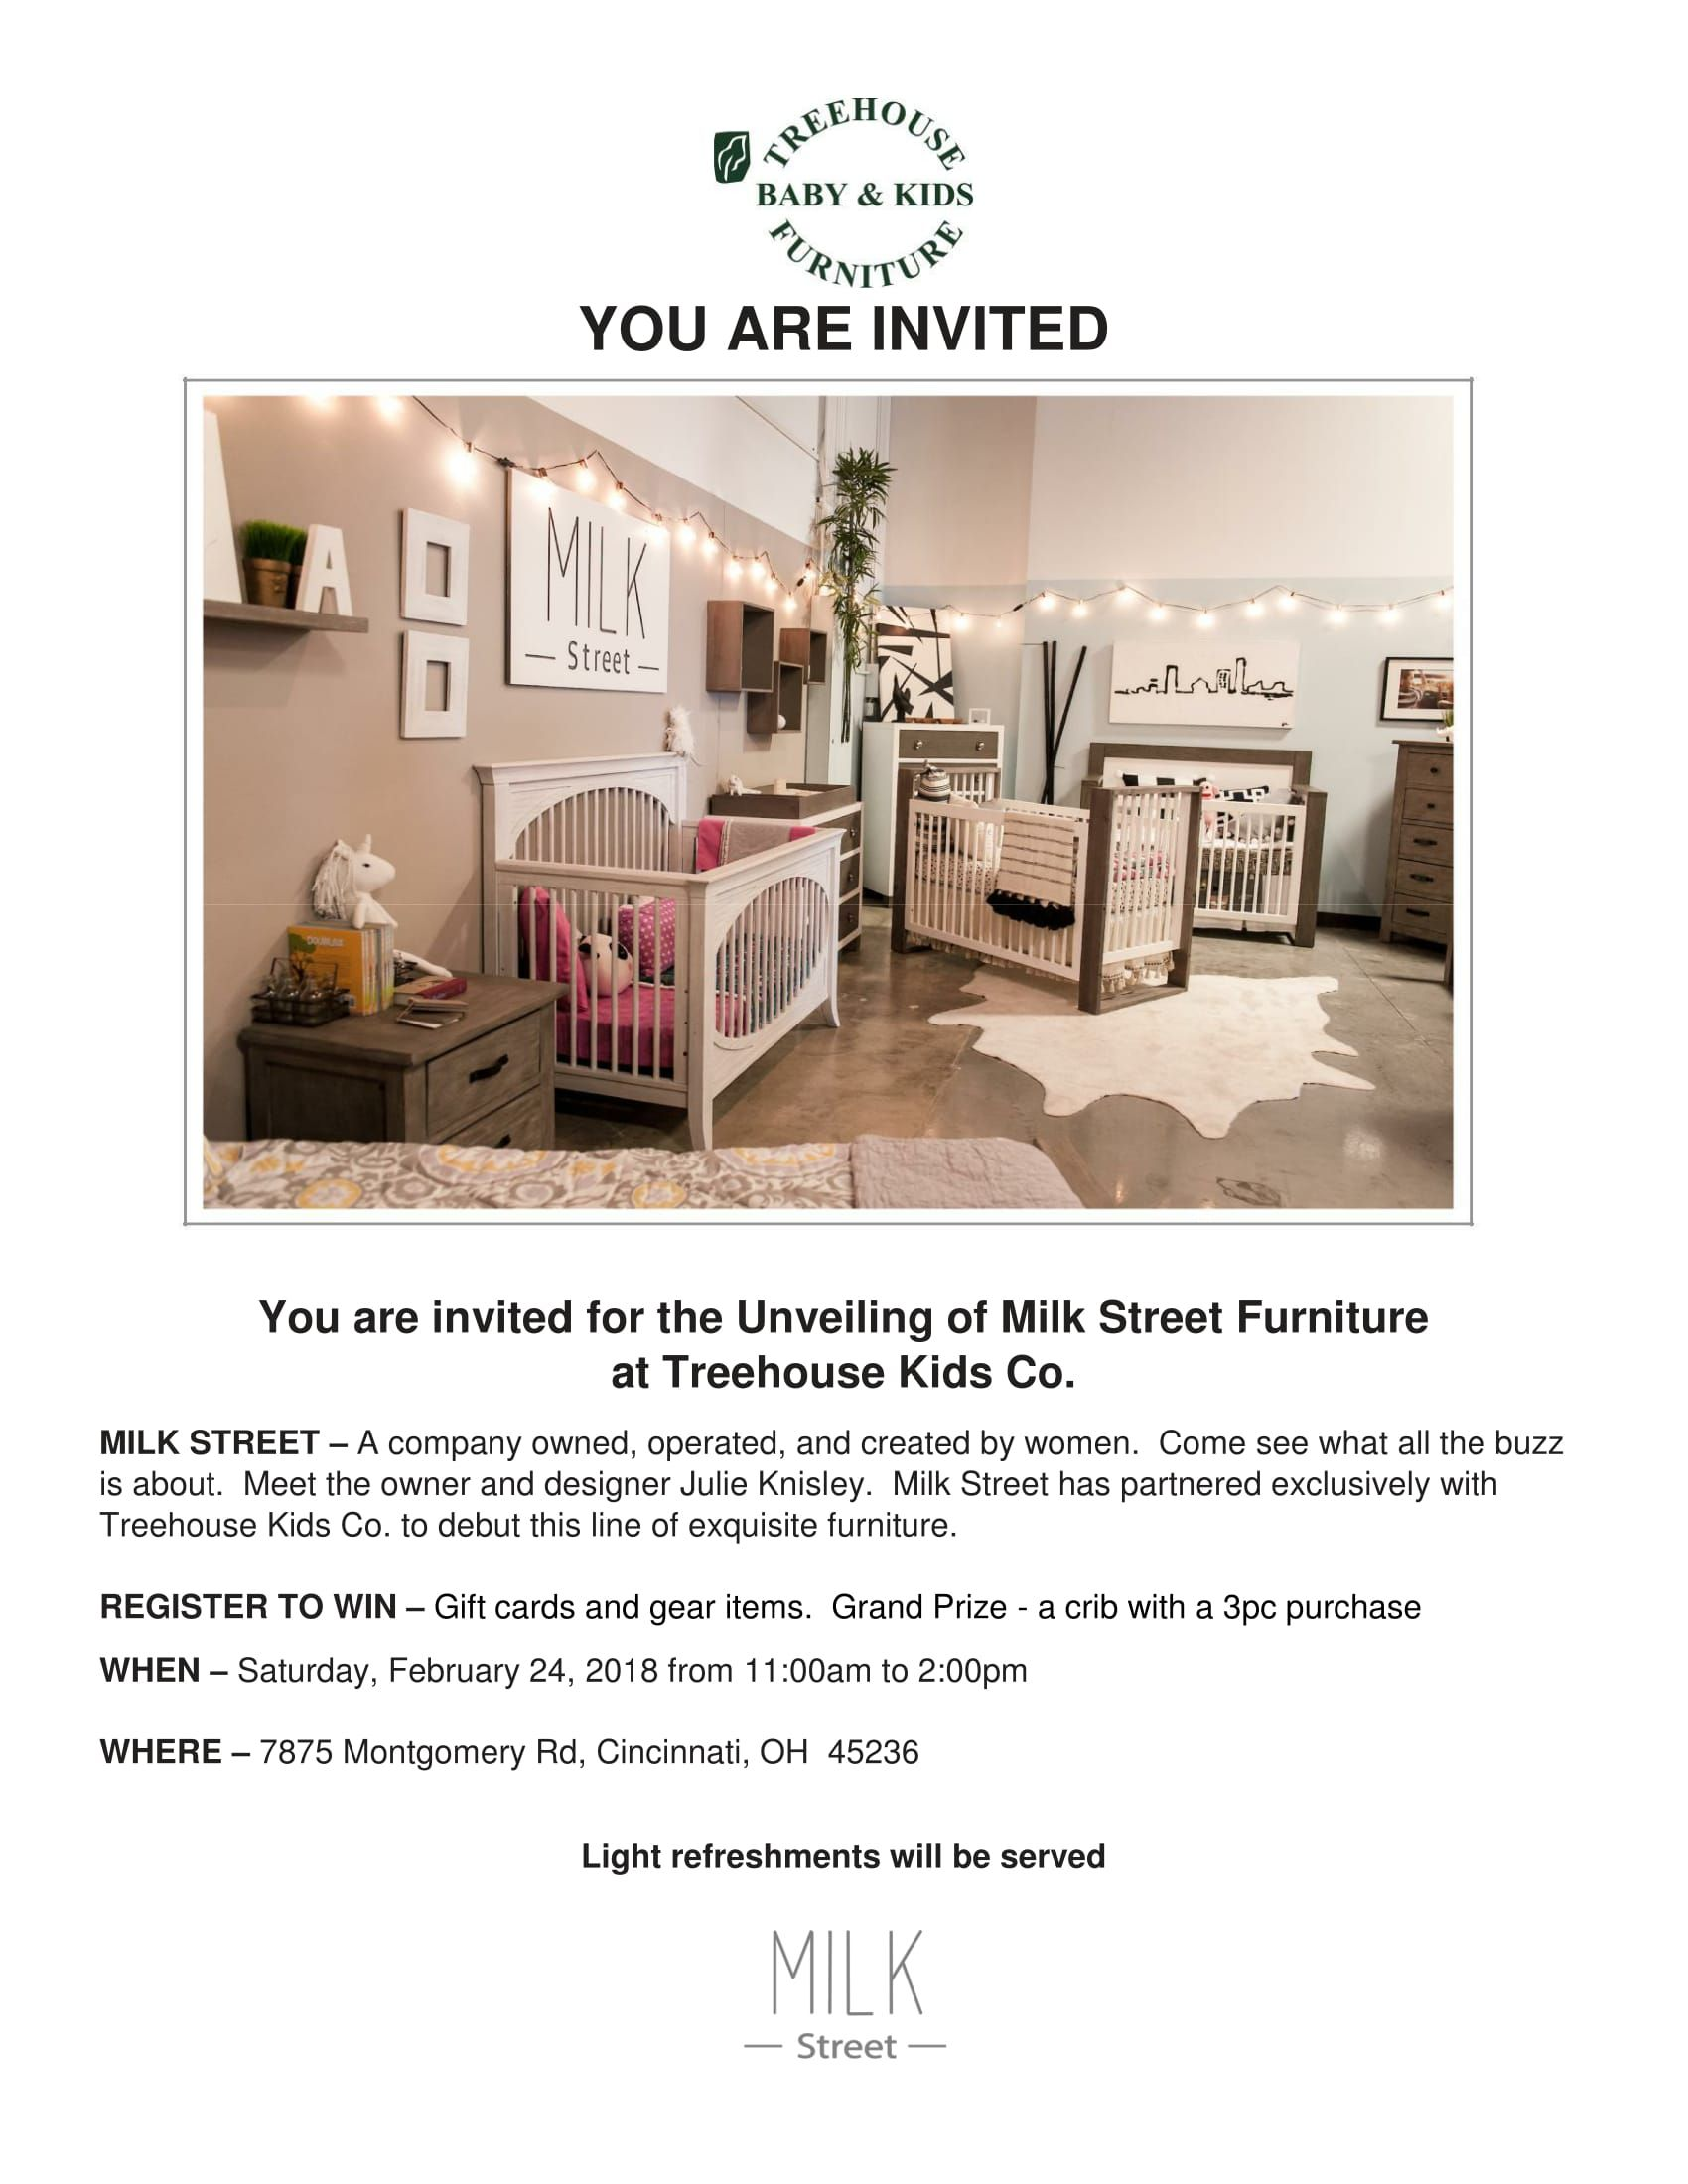 Milk Street Baby Furniture Launch Via Treehouse Kids Cincinnati